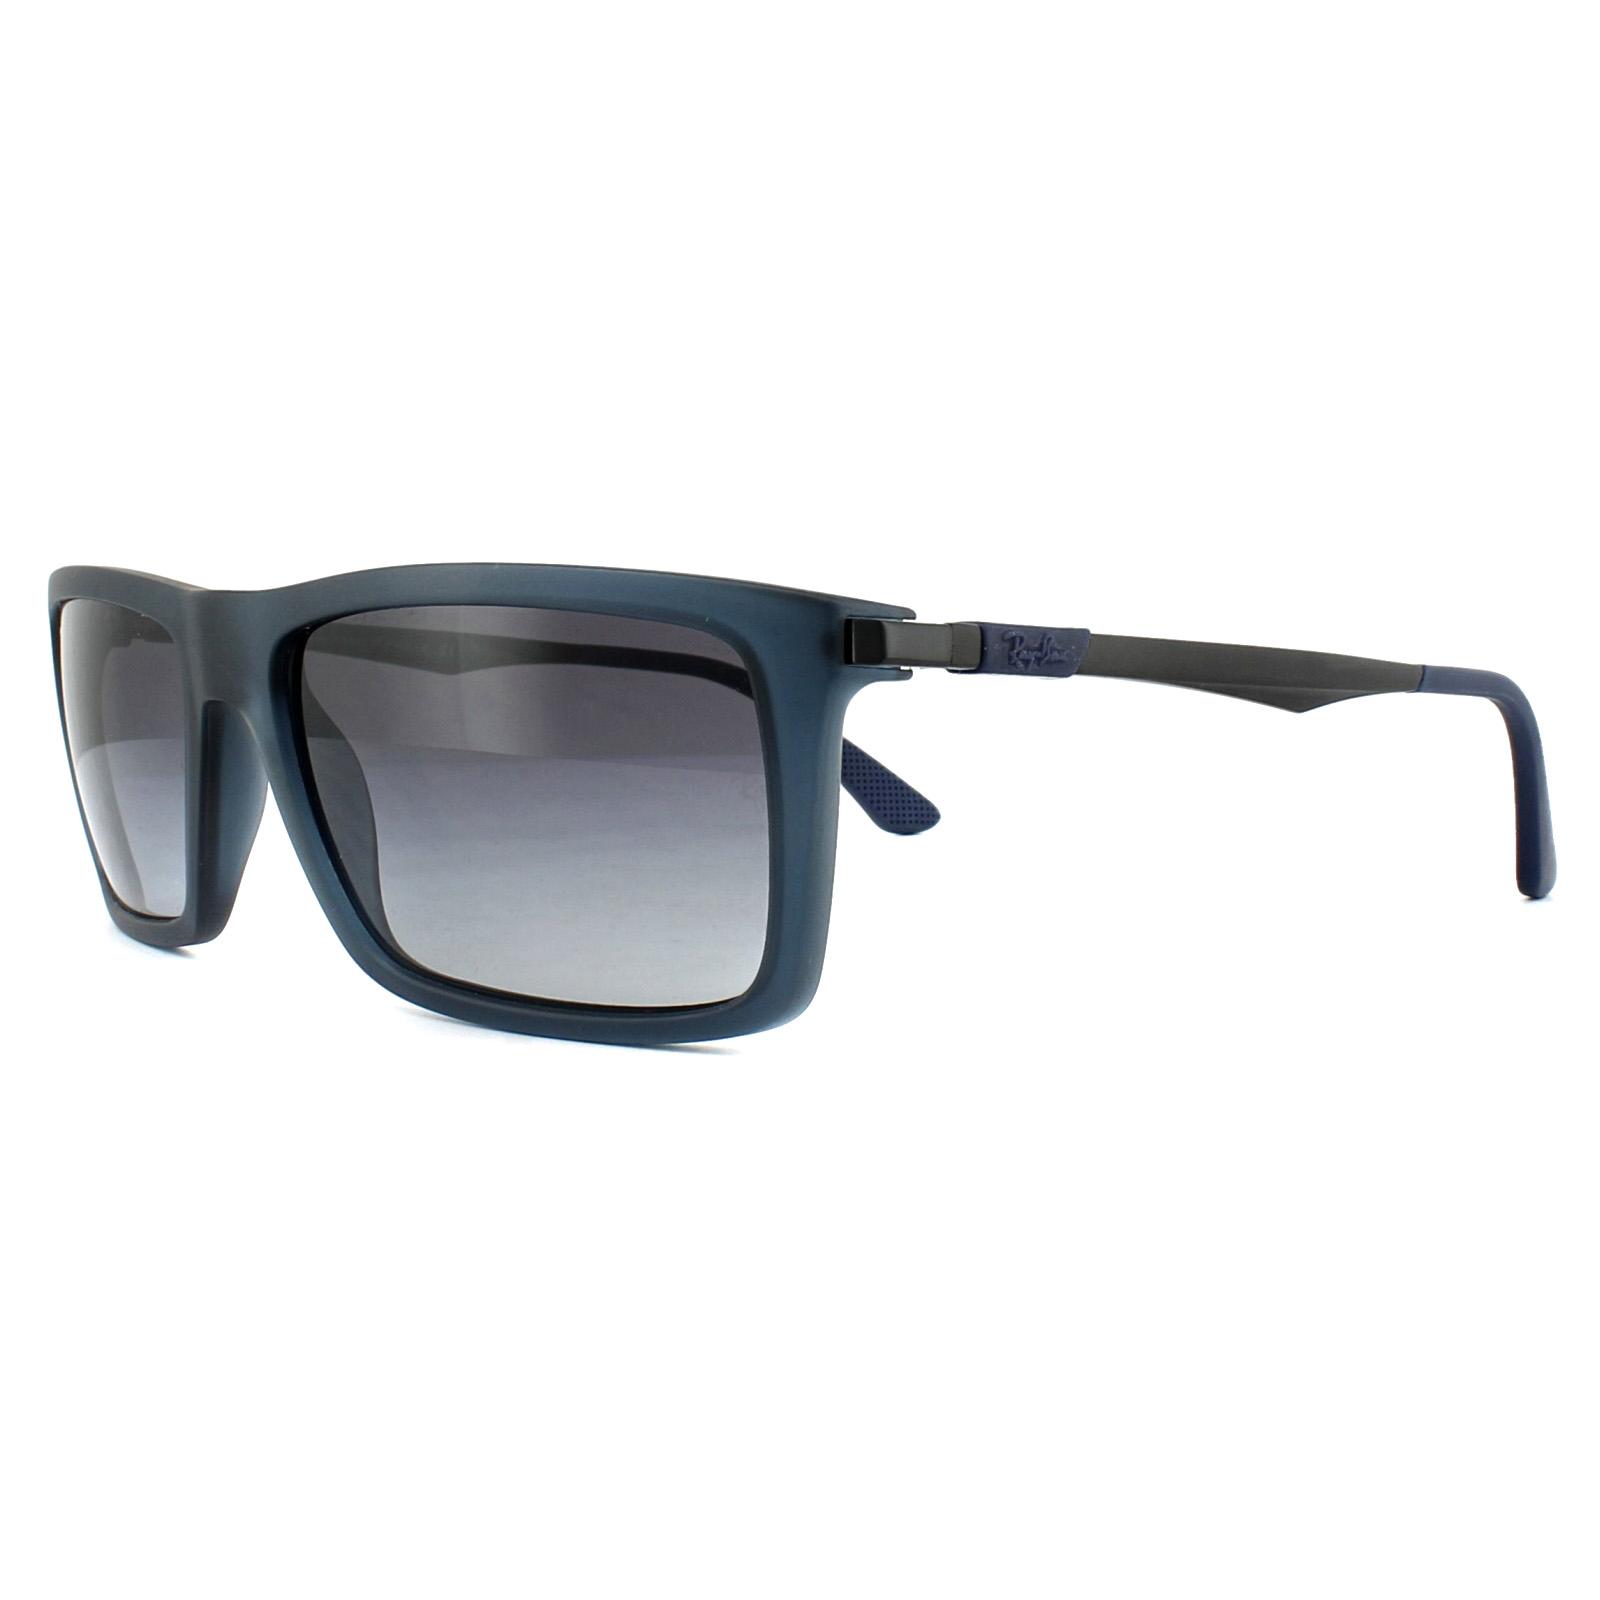 57b2f5f774 Sentinel Ray-Ban Sunglasses 4214 62978G Blue Gunmetal Grey Gradient